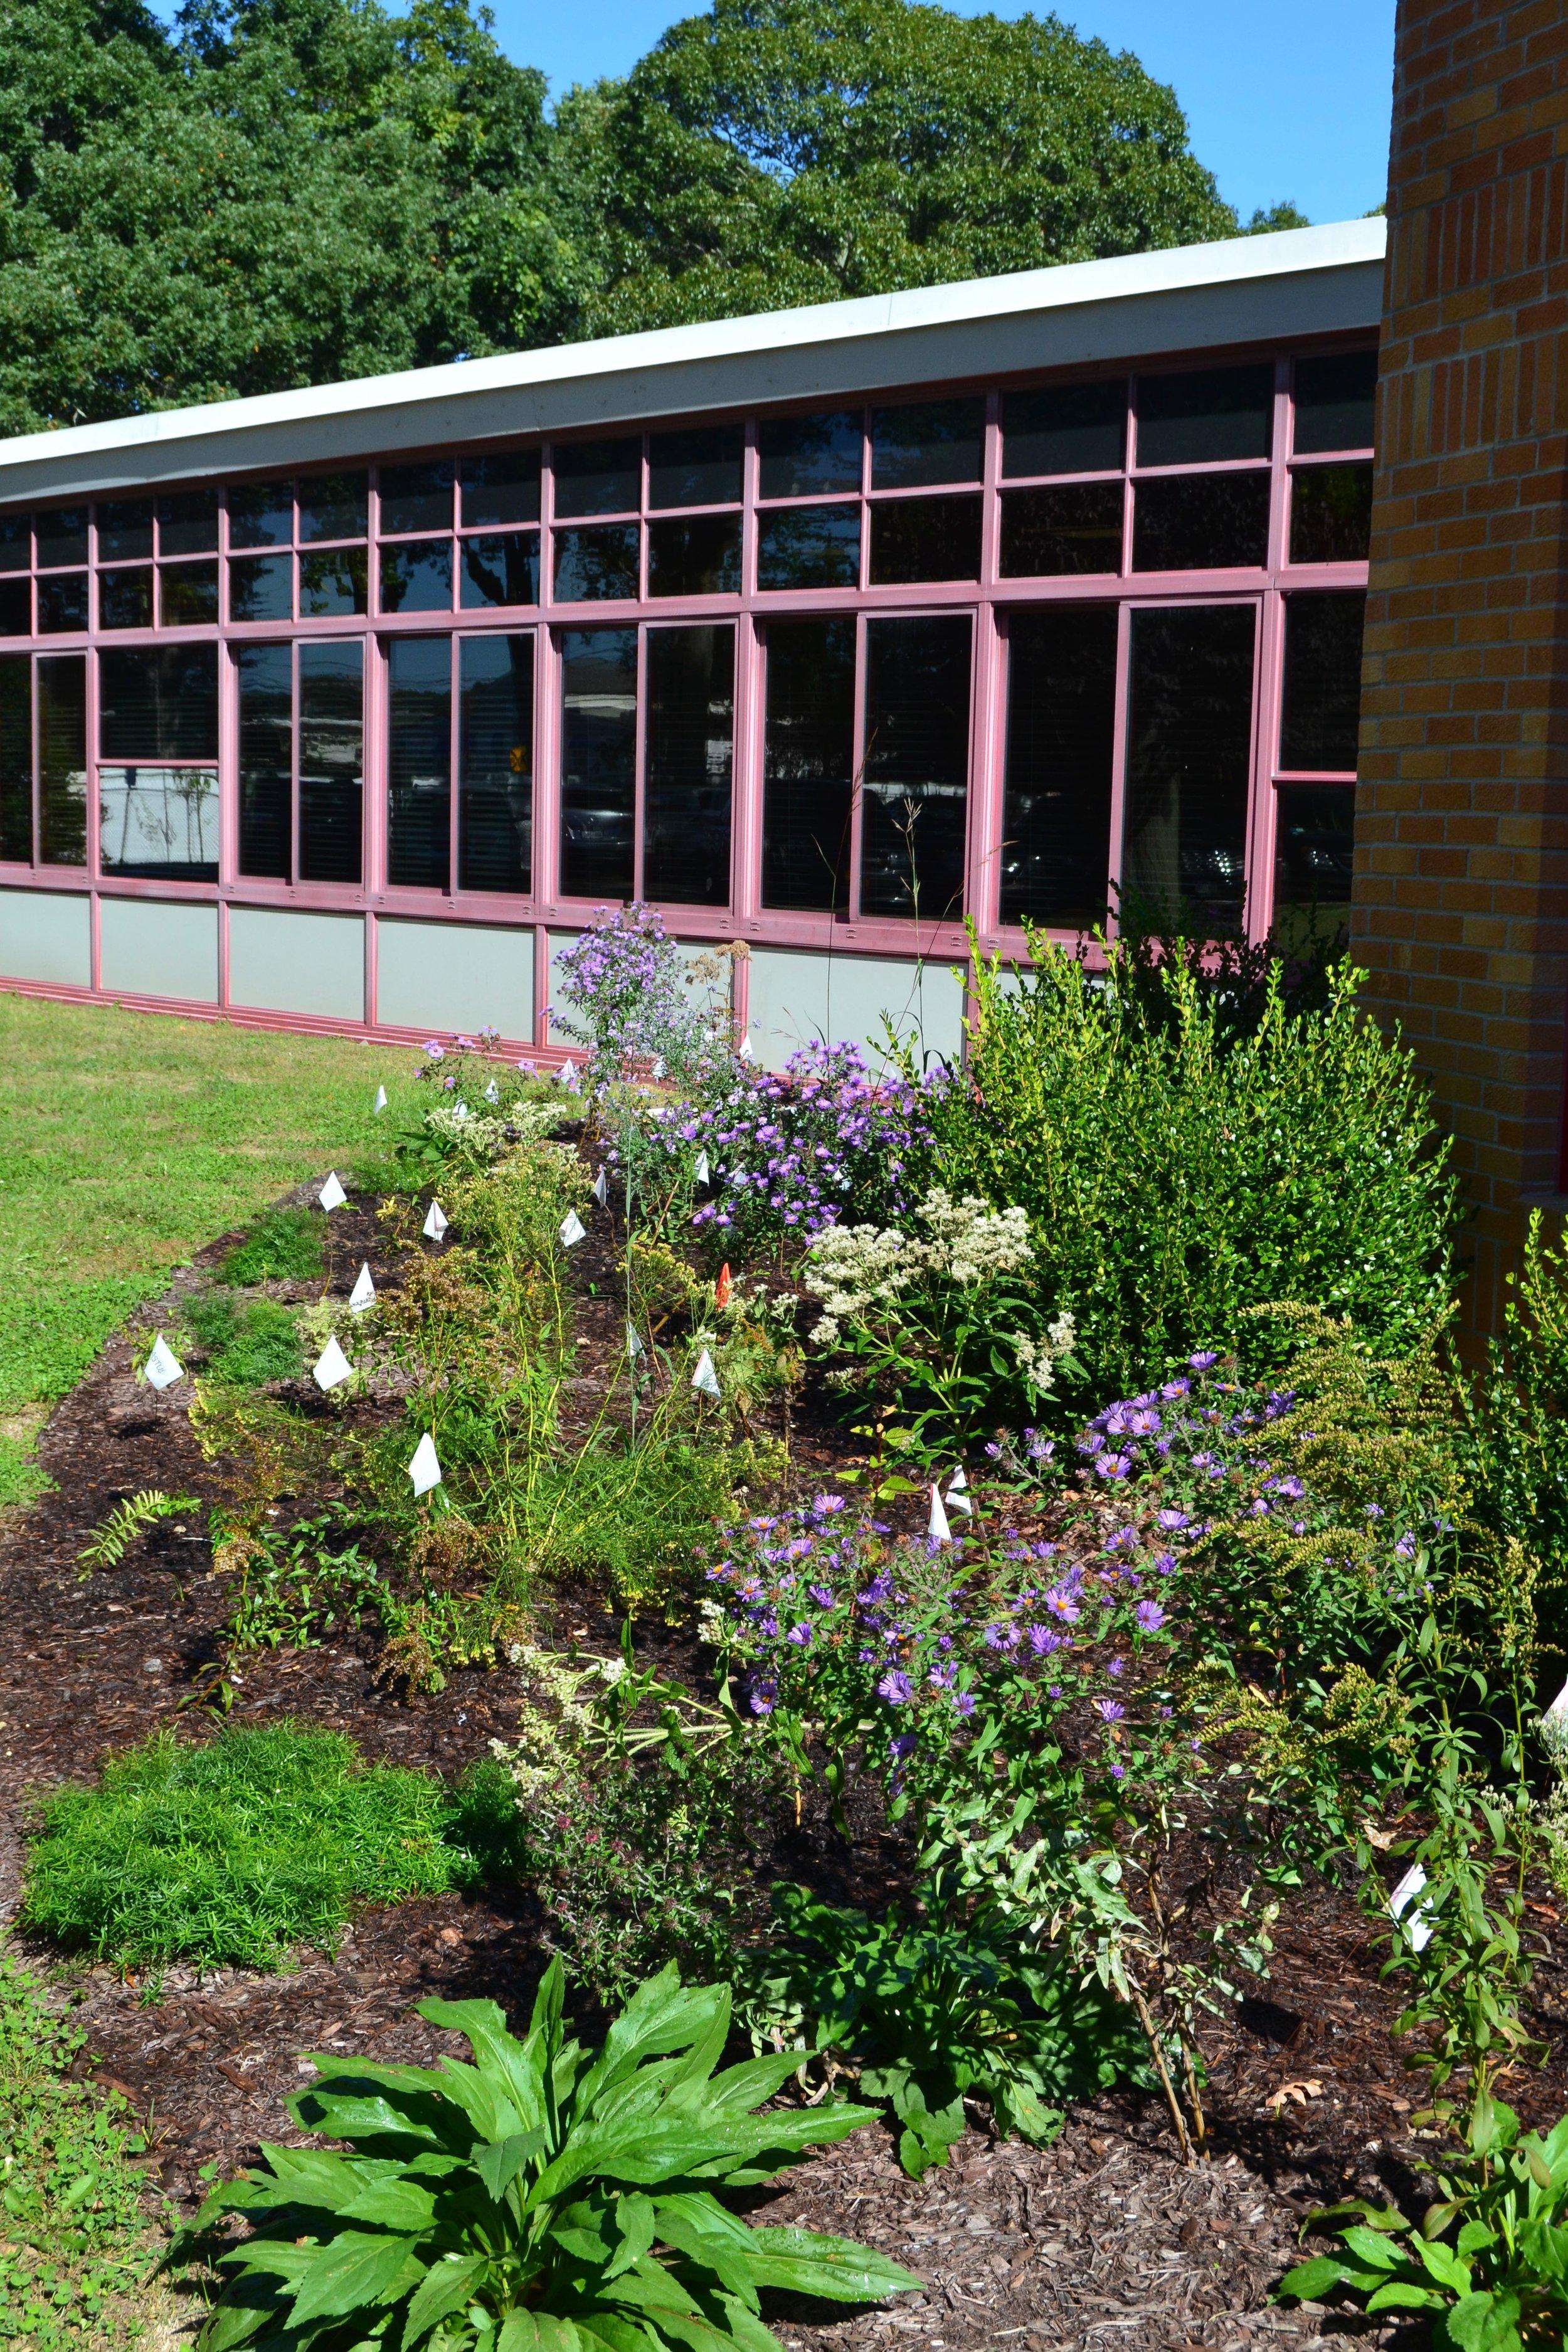 Cherry Avenue School, Sayville